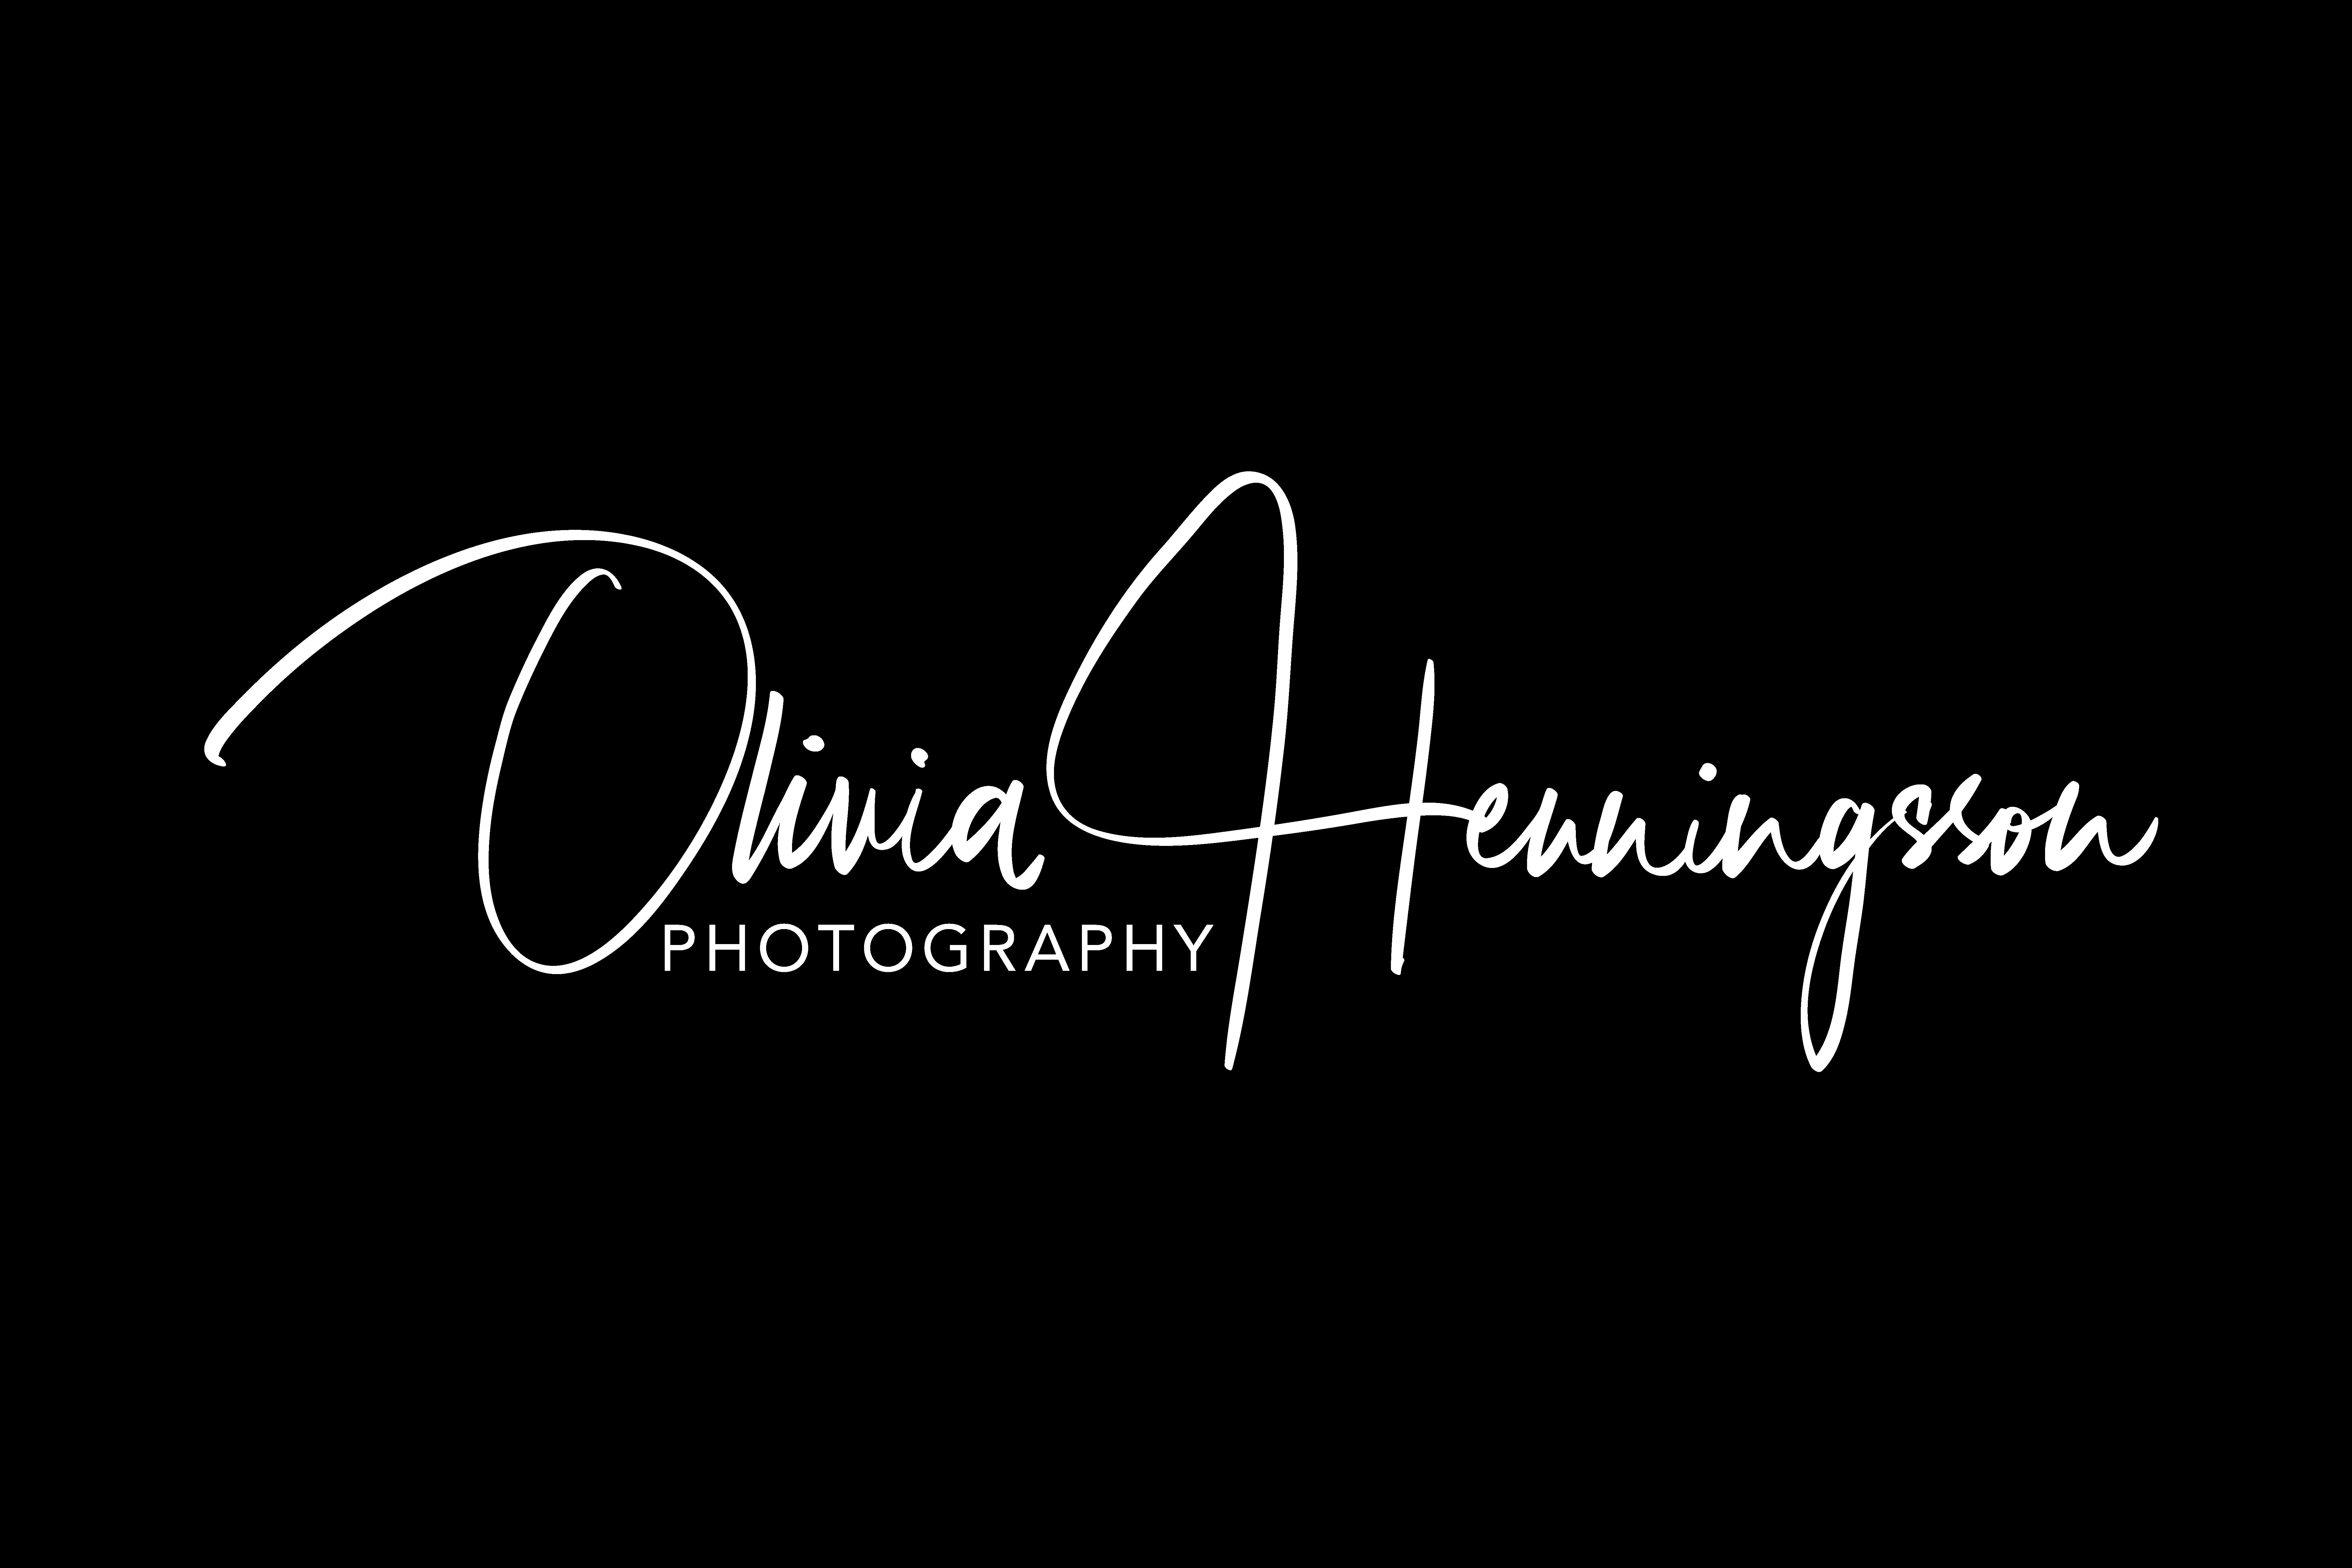 Olivia Henningsson Photography